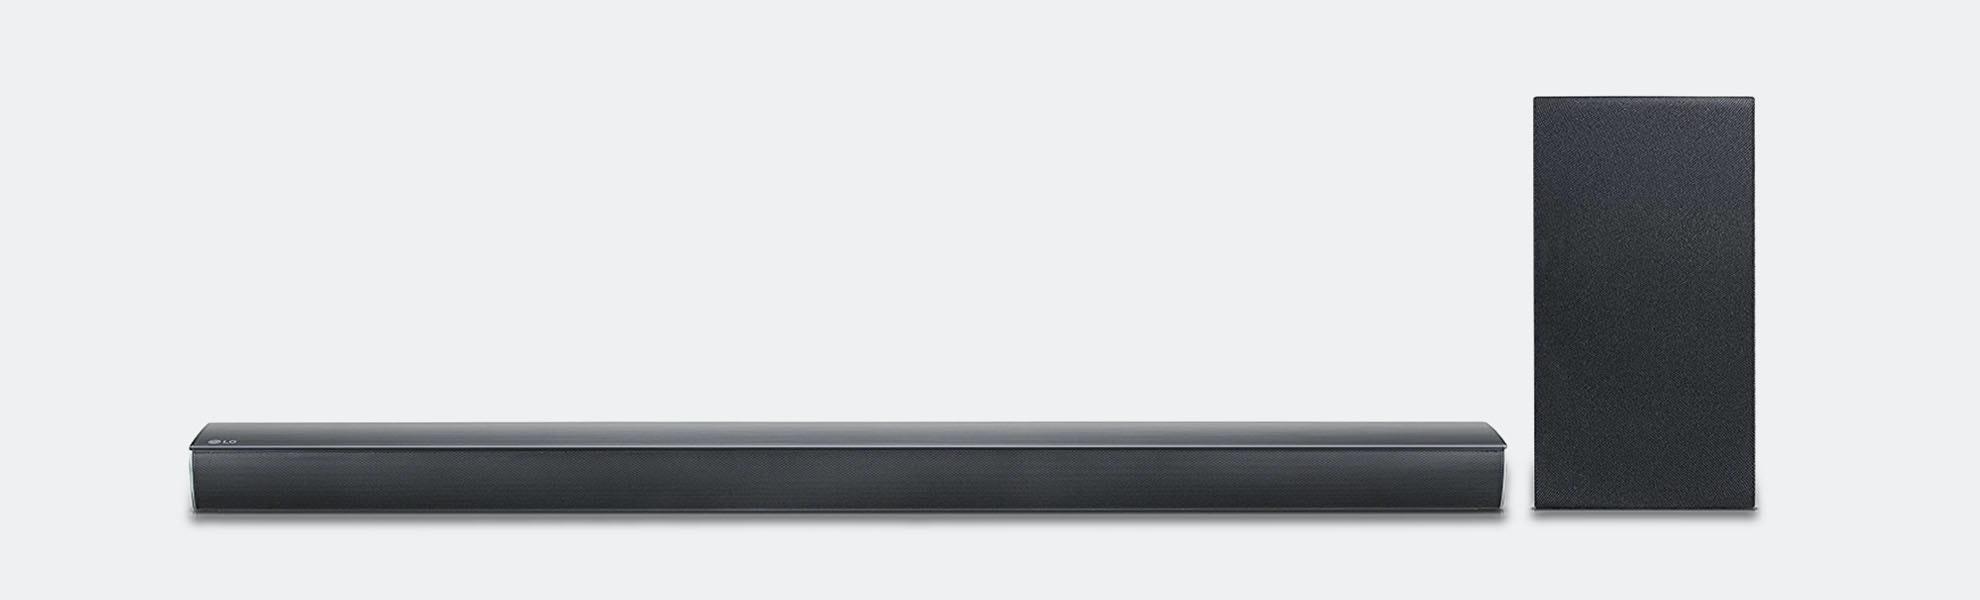 LG Wireless Soundbars With High-Resolution Audio